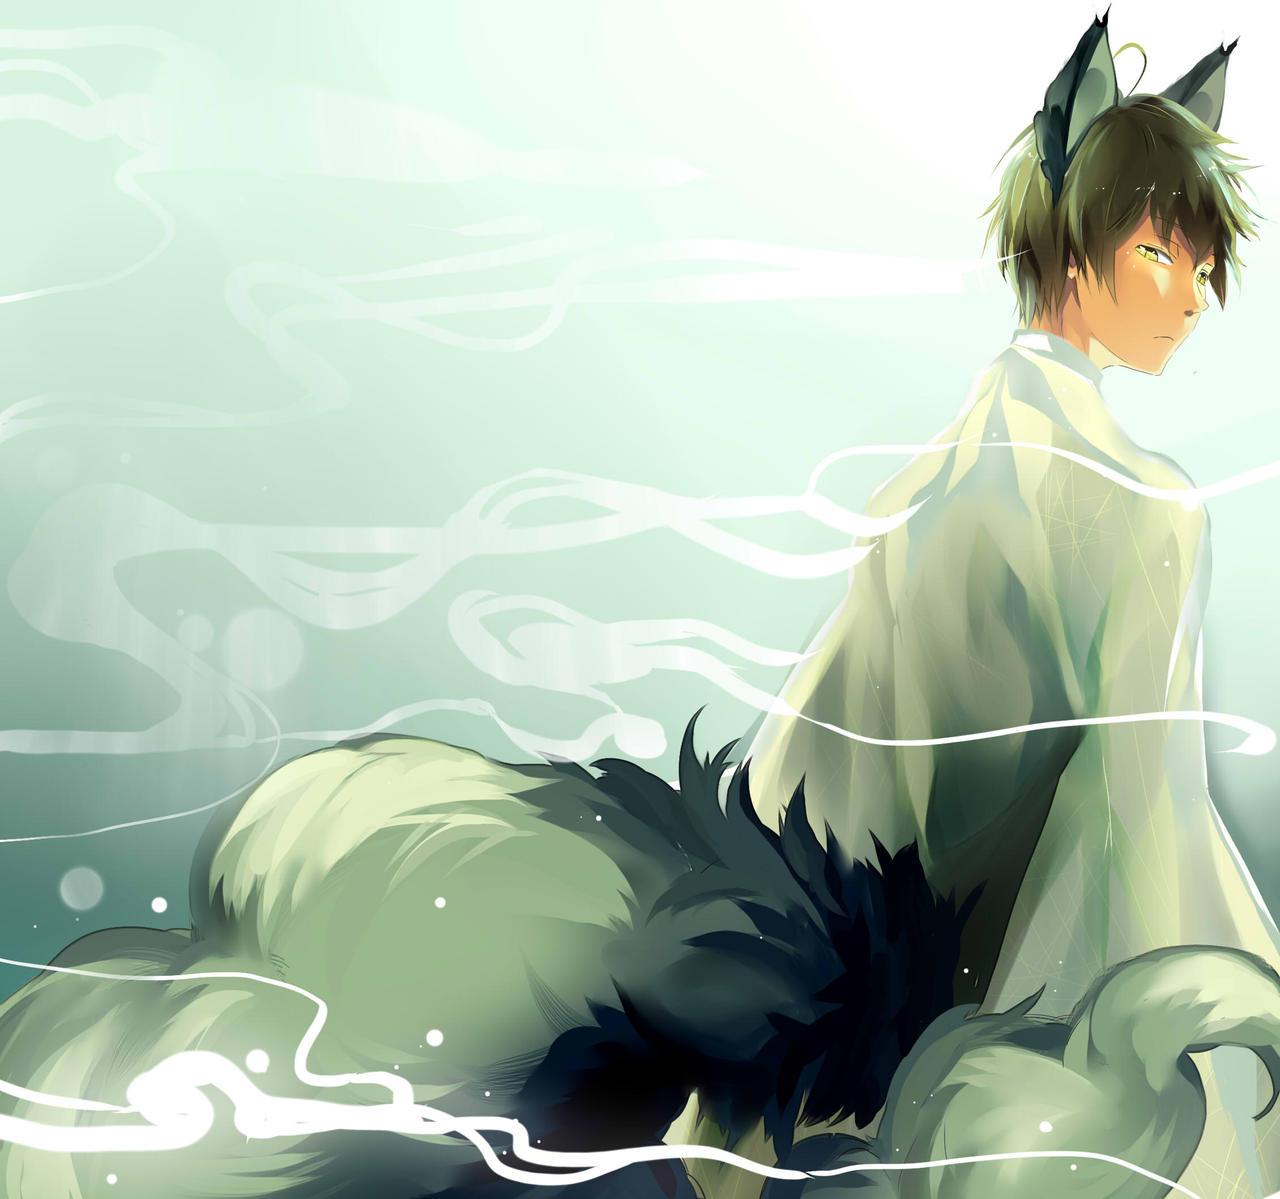 anime fox spirit wallpapers - photo #6